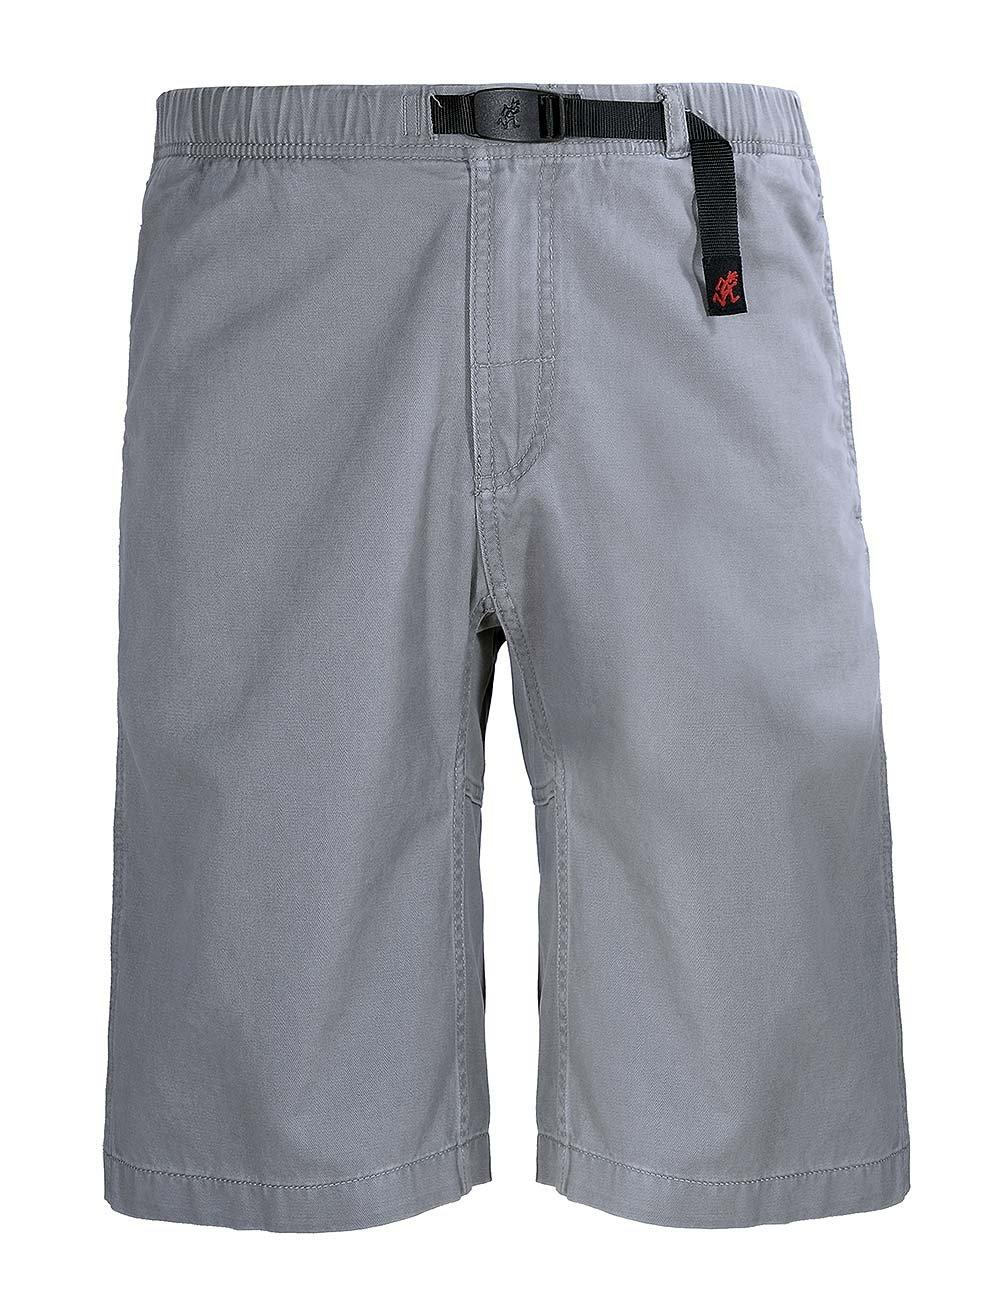 Gramicci Rockin Sport Short - Men's Stainless Steel